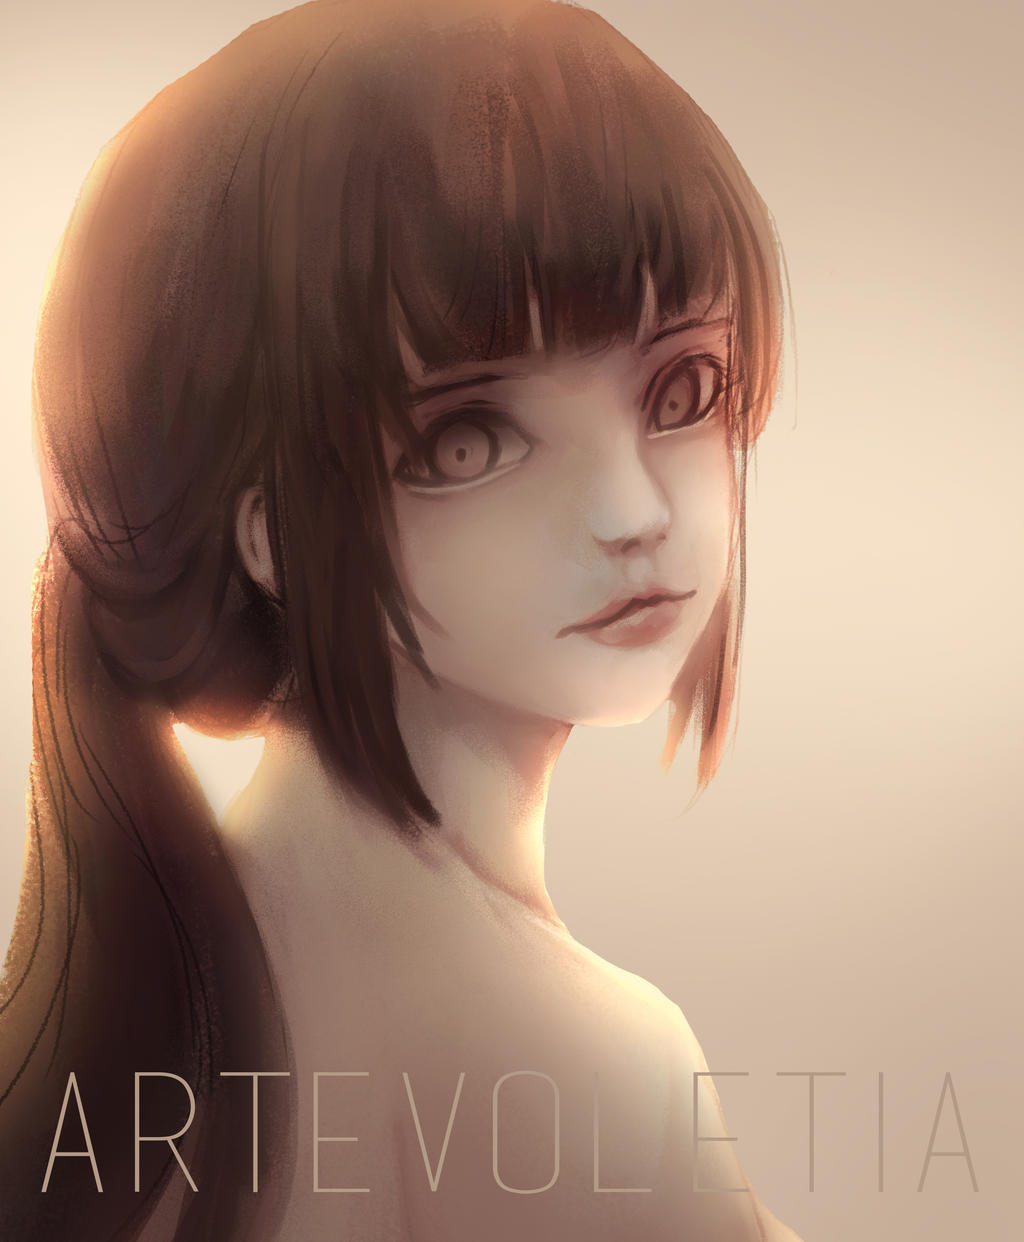 Soft by artevoletia